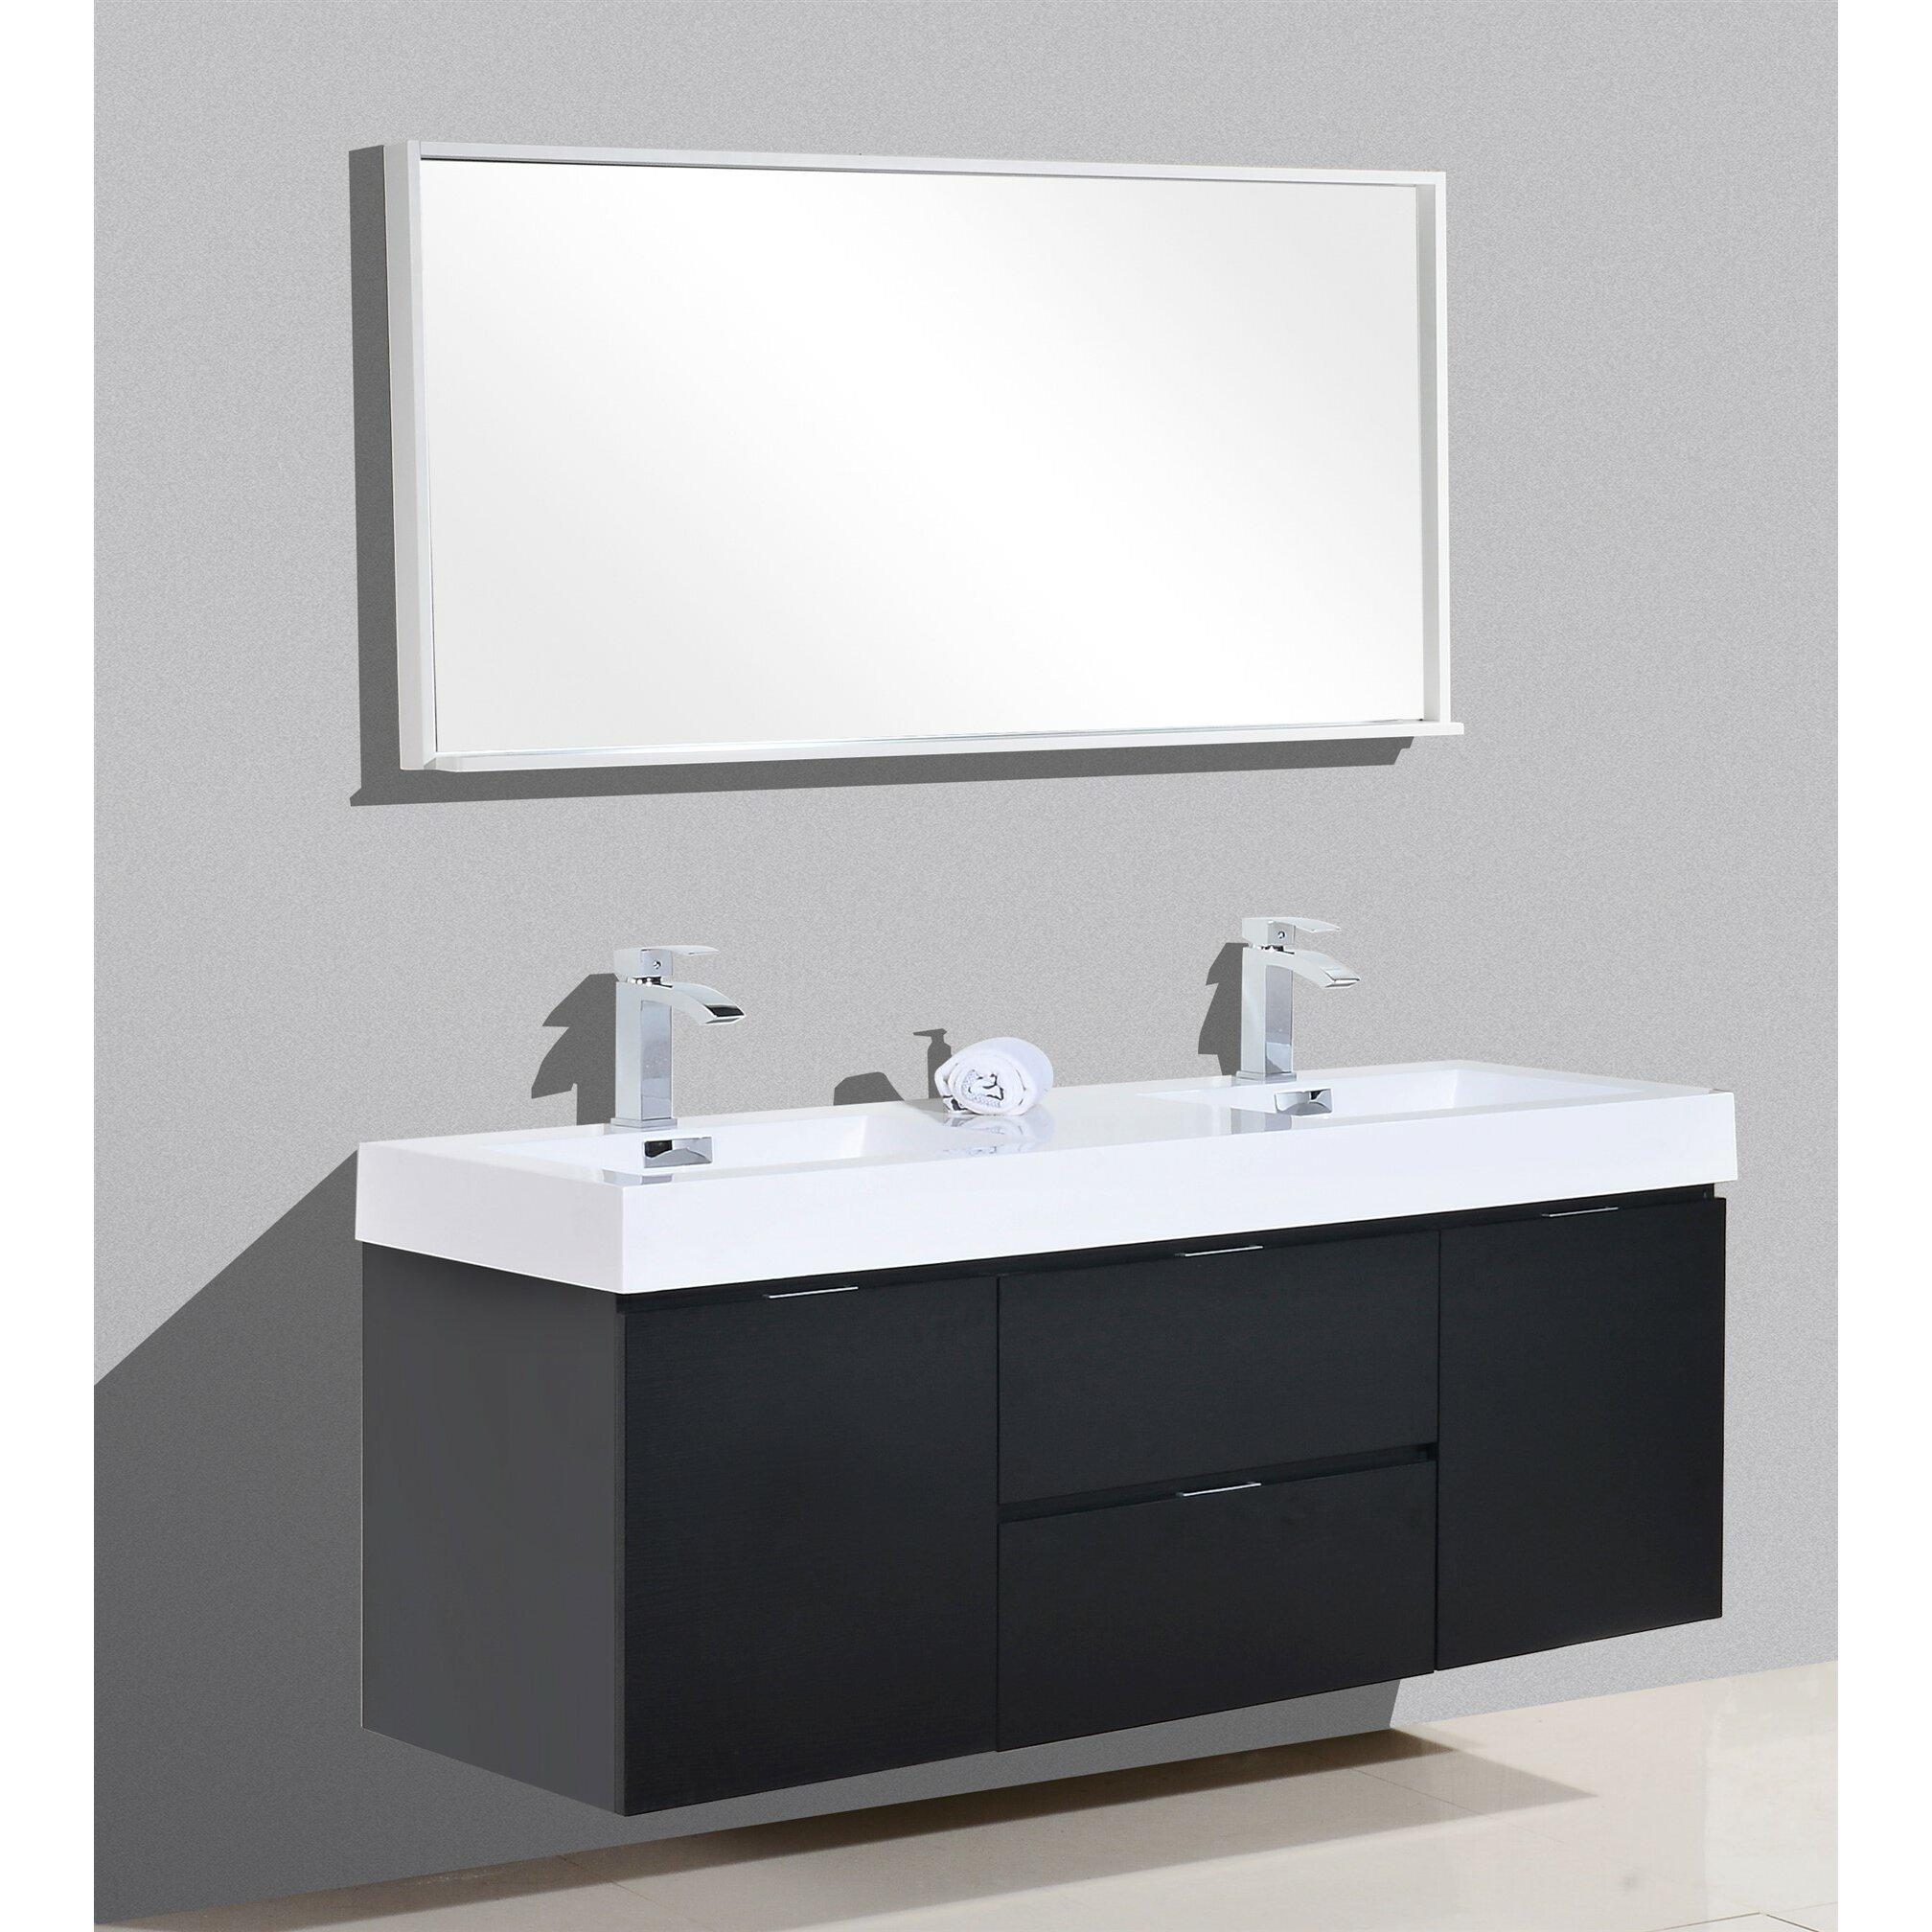 Kube Bath Bliss 60 Double Wall Mount Modern Bathroom Vanity Set Reviews Wayfair